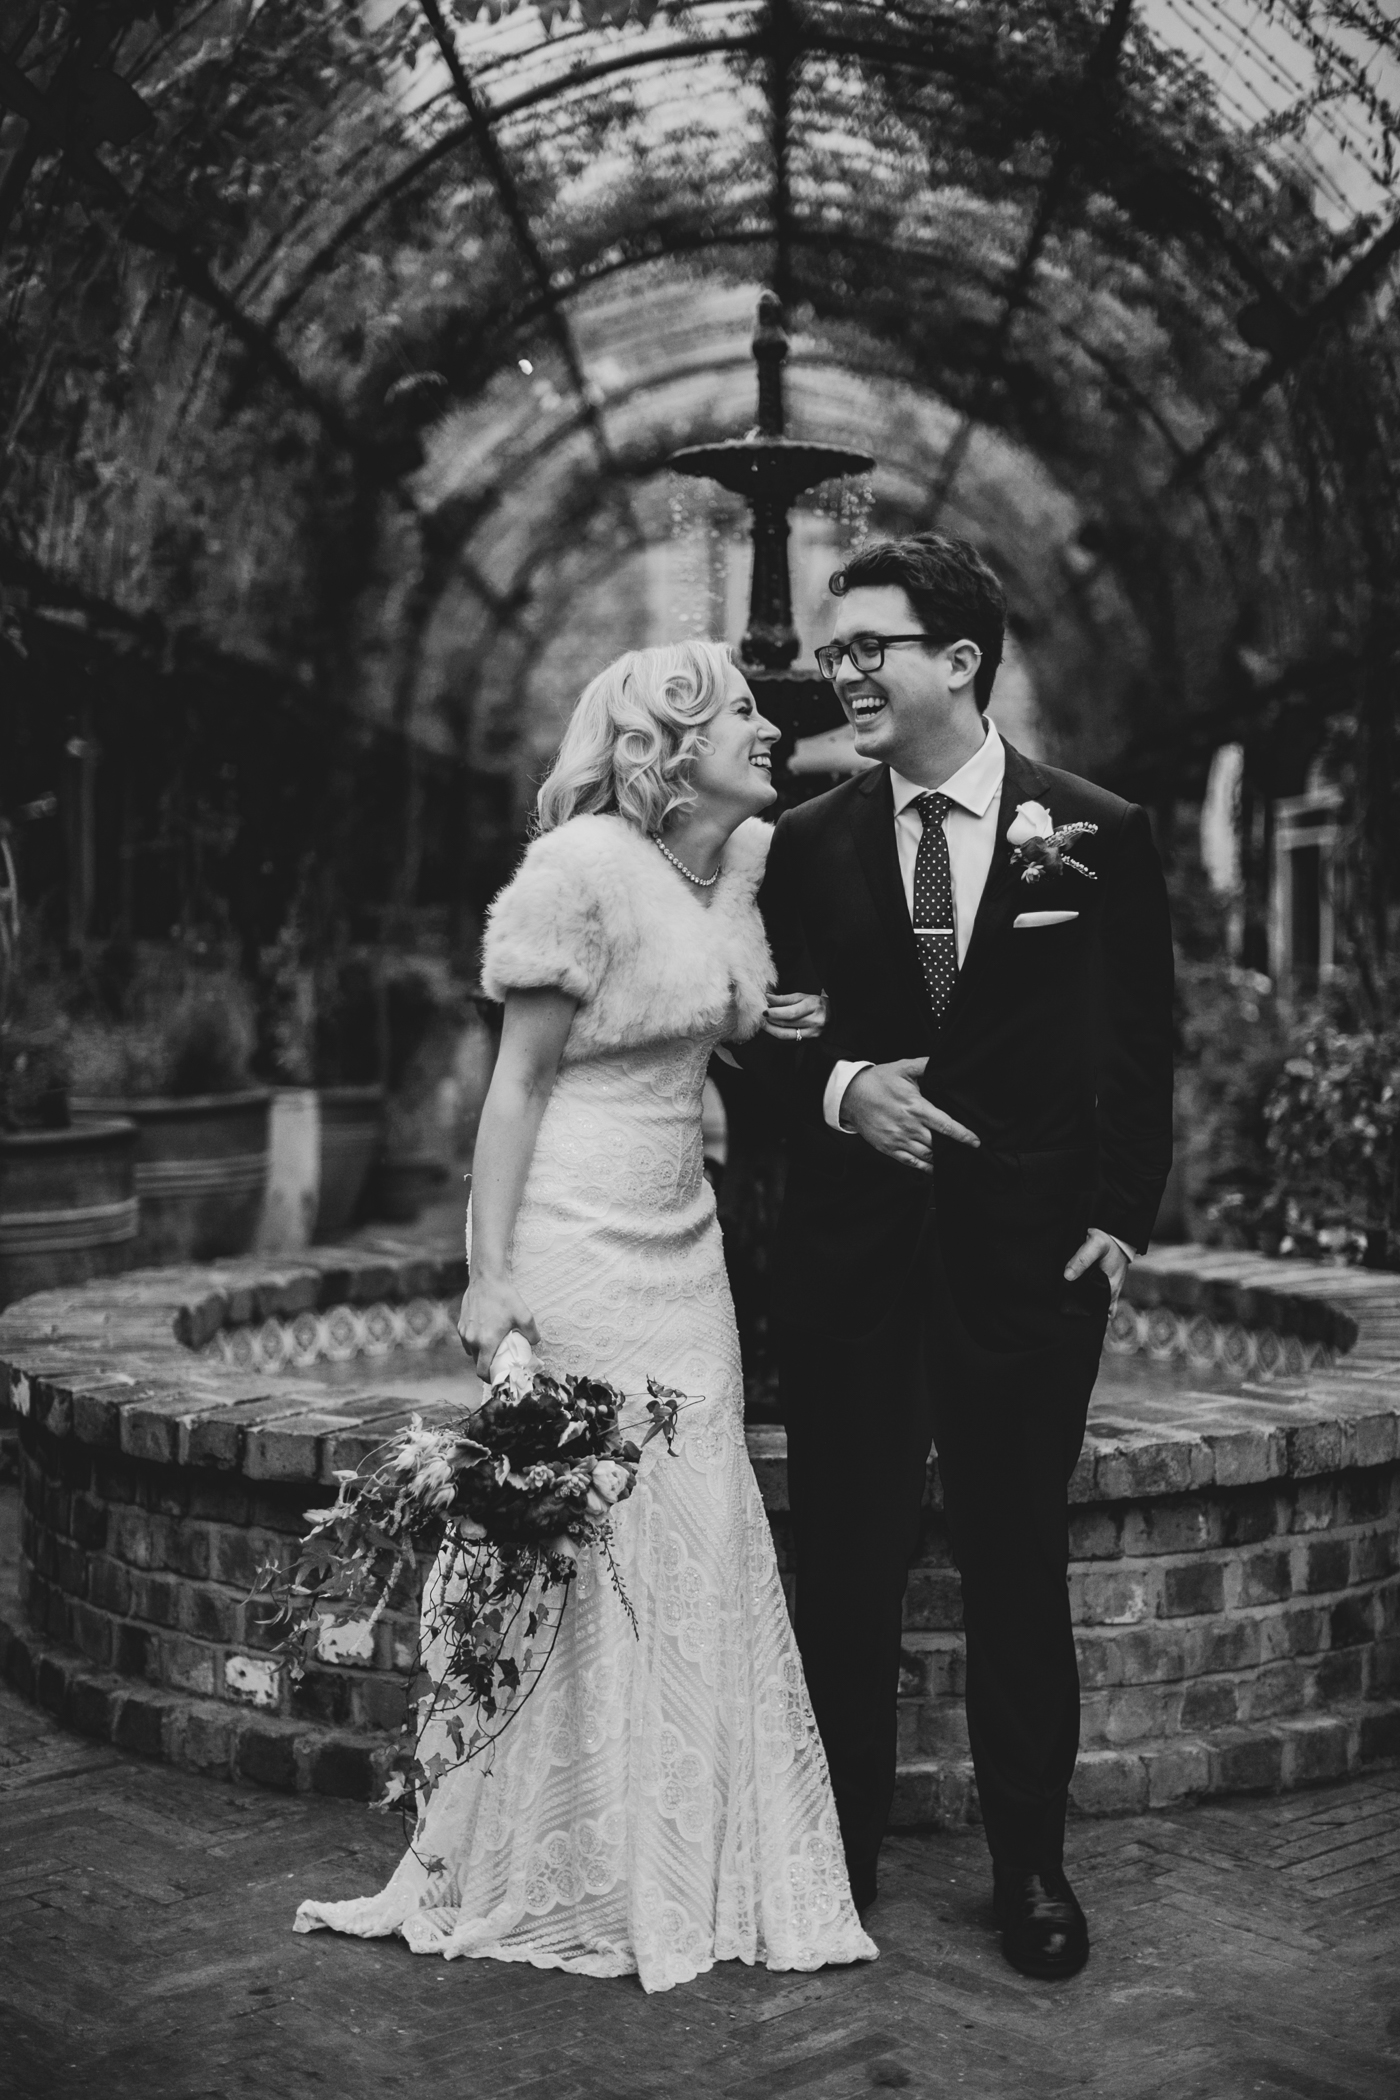 Jo & Tom Wedding - The Grounds of Alexandria - Samantha Heather Photography-220.jpg